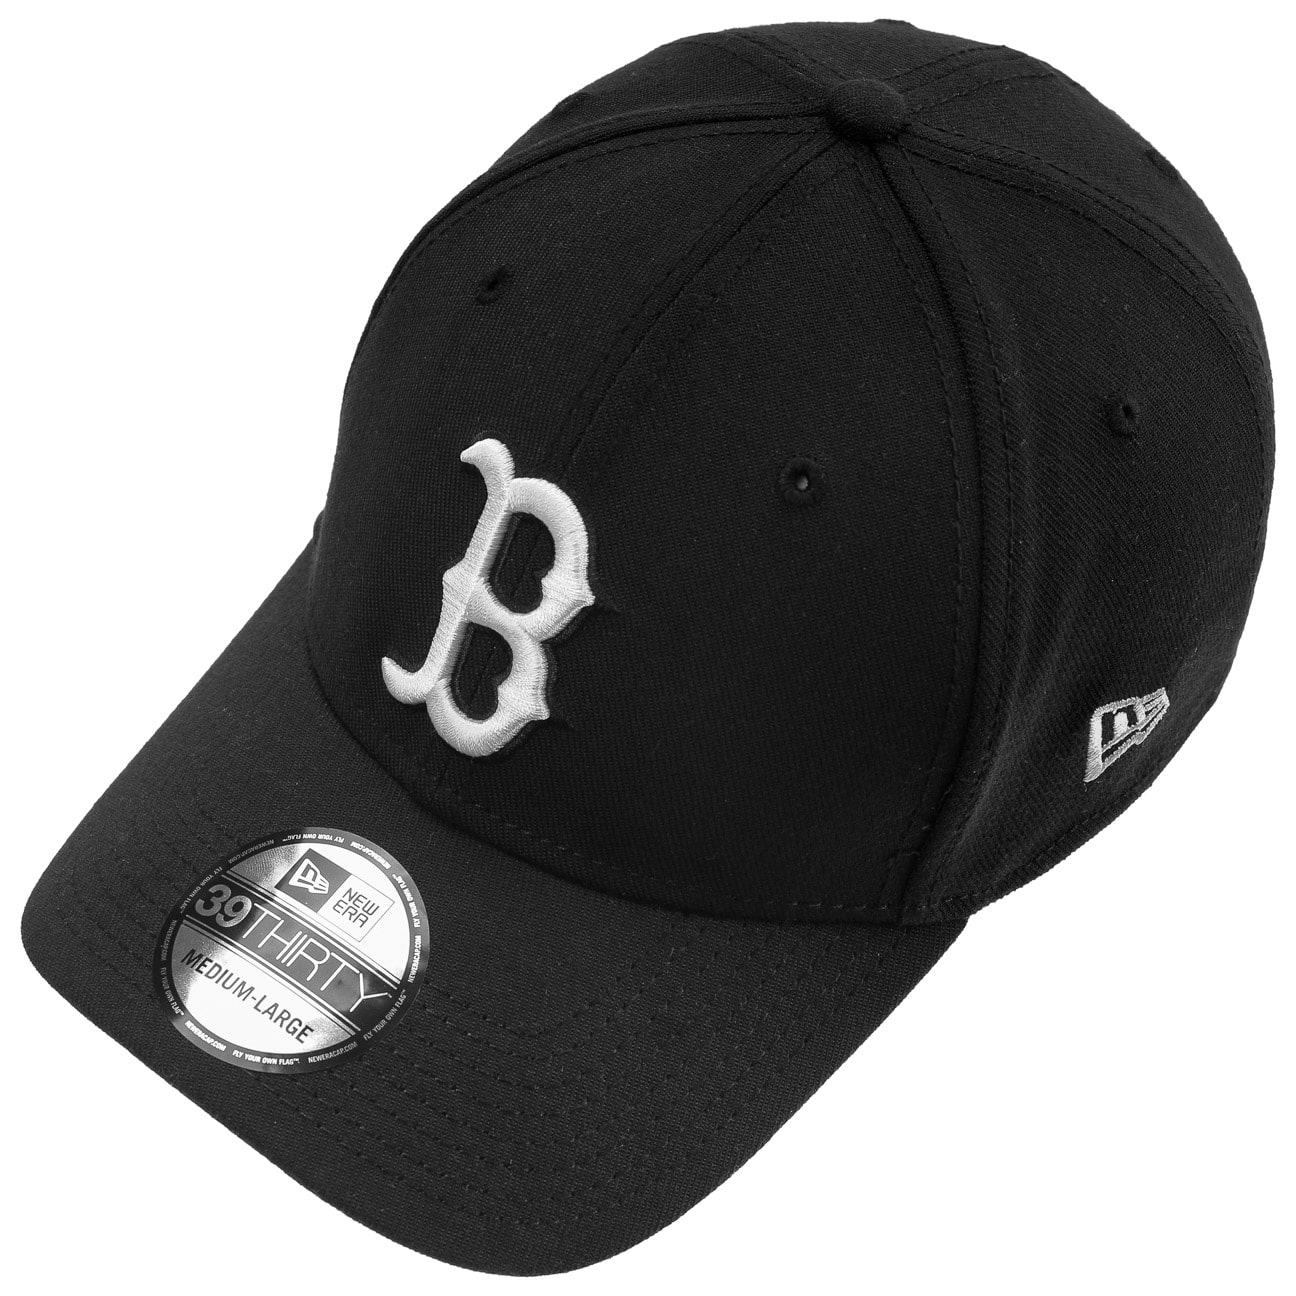 c7fbe145 39Thirty Boston Red Sox Basecap by New Era - black 2 ...